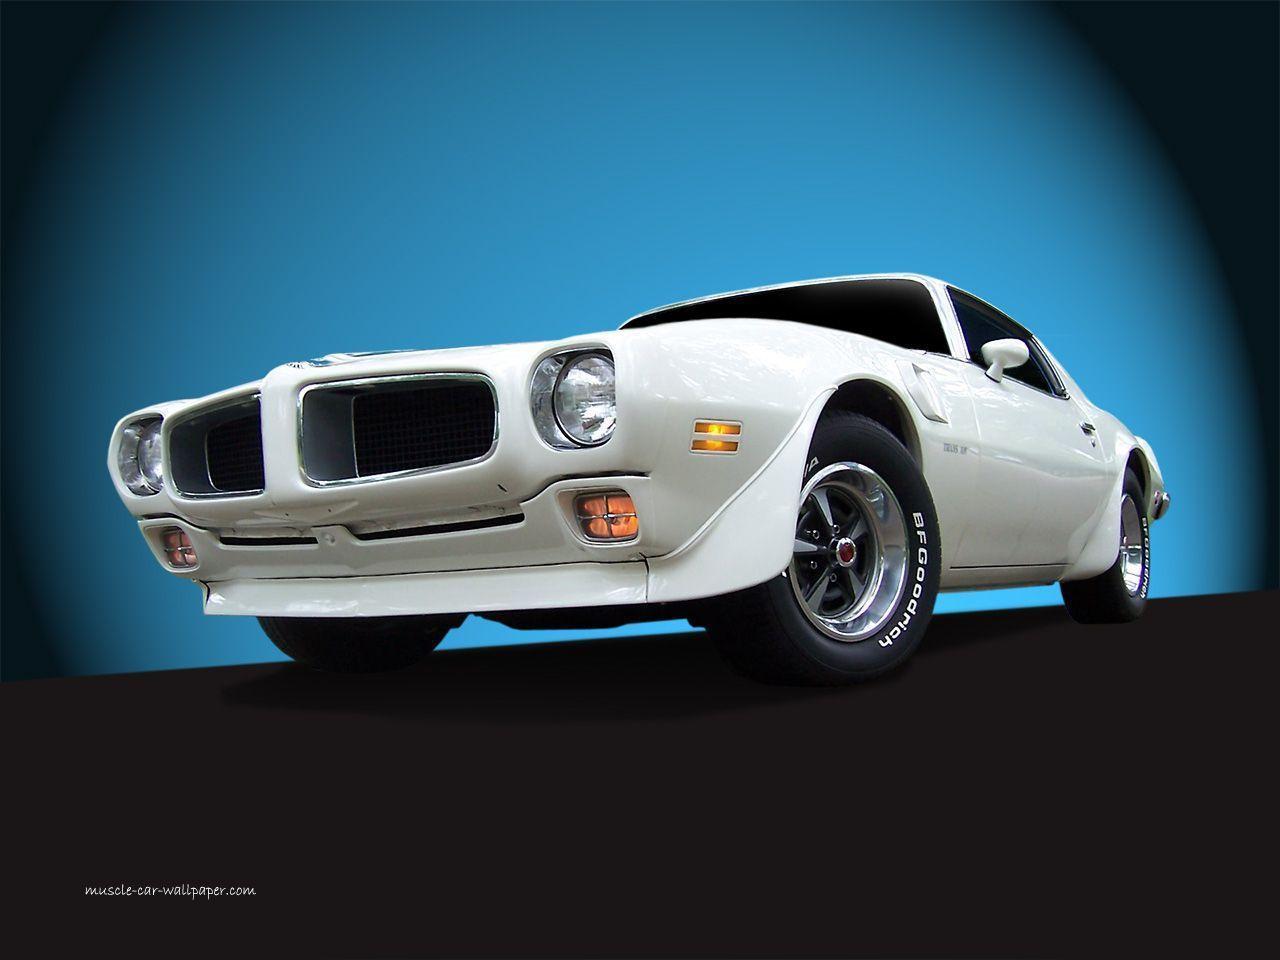 https://wallpapercave.com/wp/2RfX6TA.jpg Muscle Cars Wallpapers High Resolution